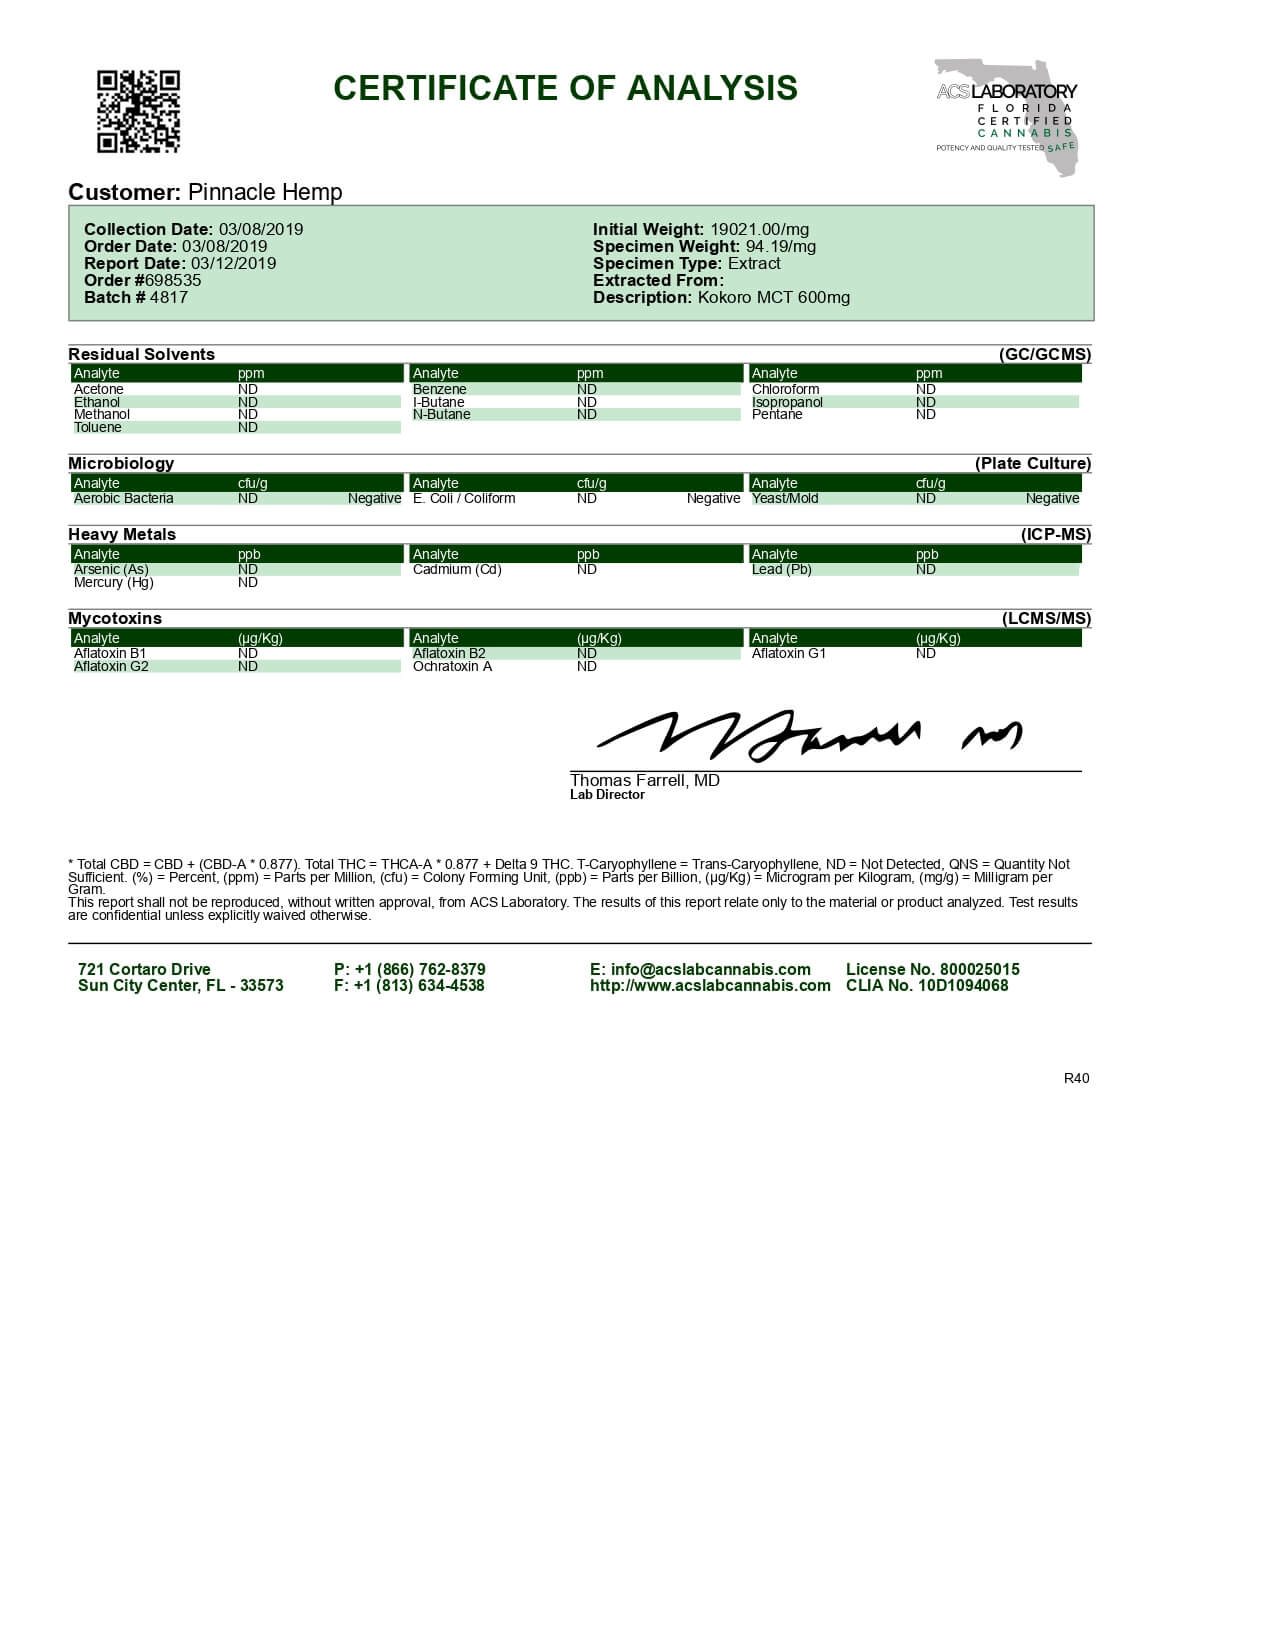 Kokoro CBD Tincture Broad Spectrum MCT Oil 600mg Lab Report